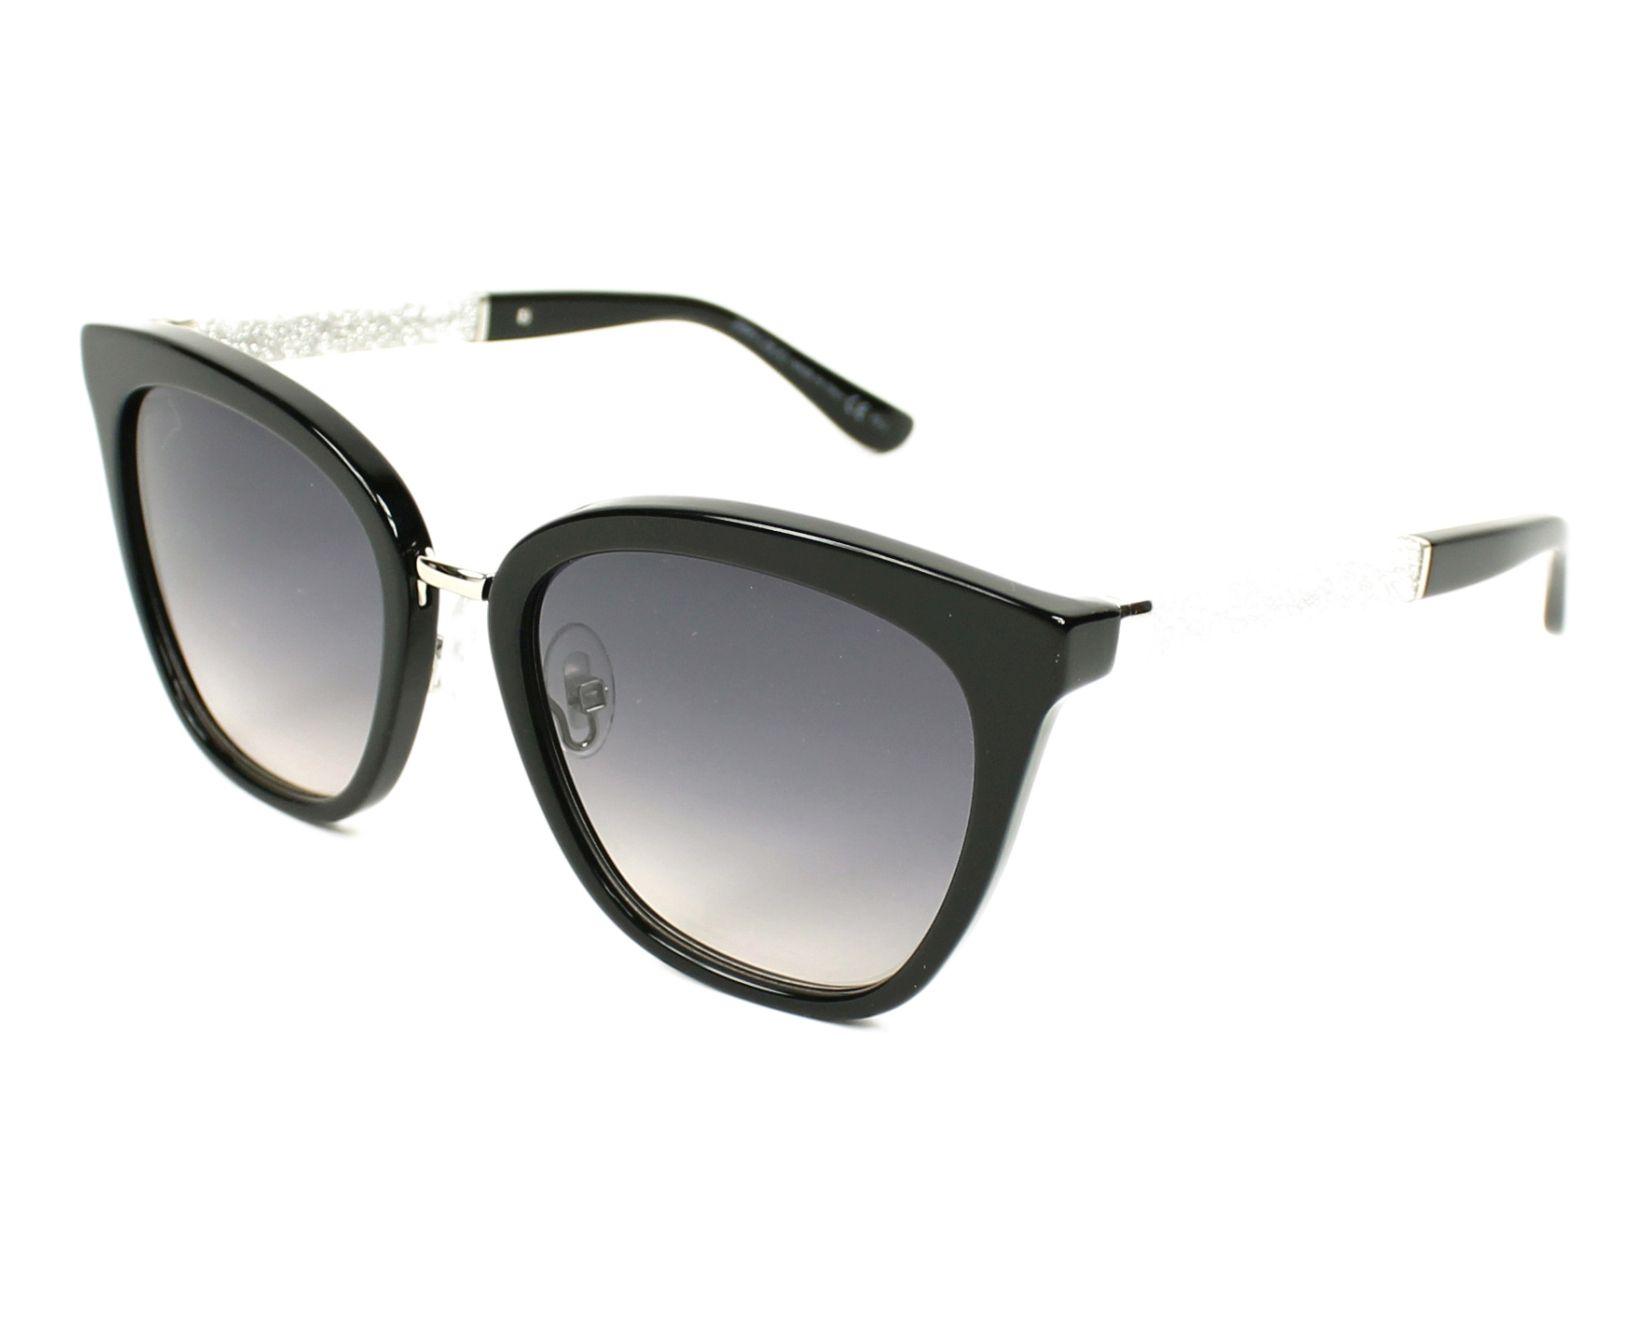 754018c94e9 Jimmy Choo Sunglasses FABRY-S FA3 9C 53-19 Black Silver